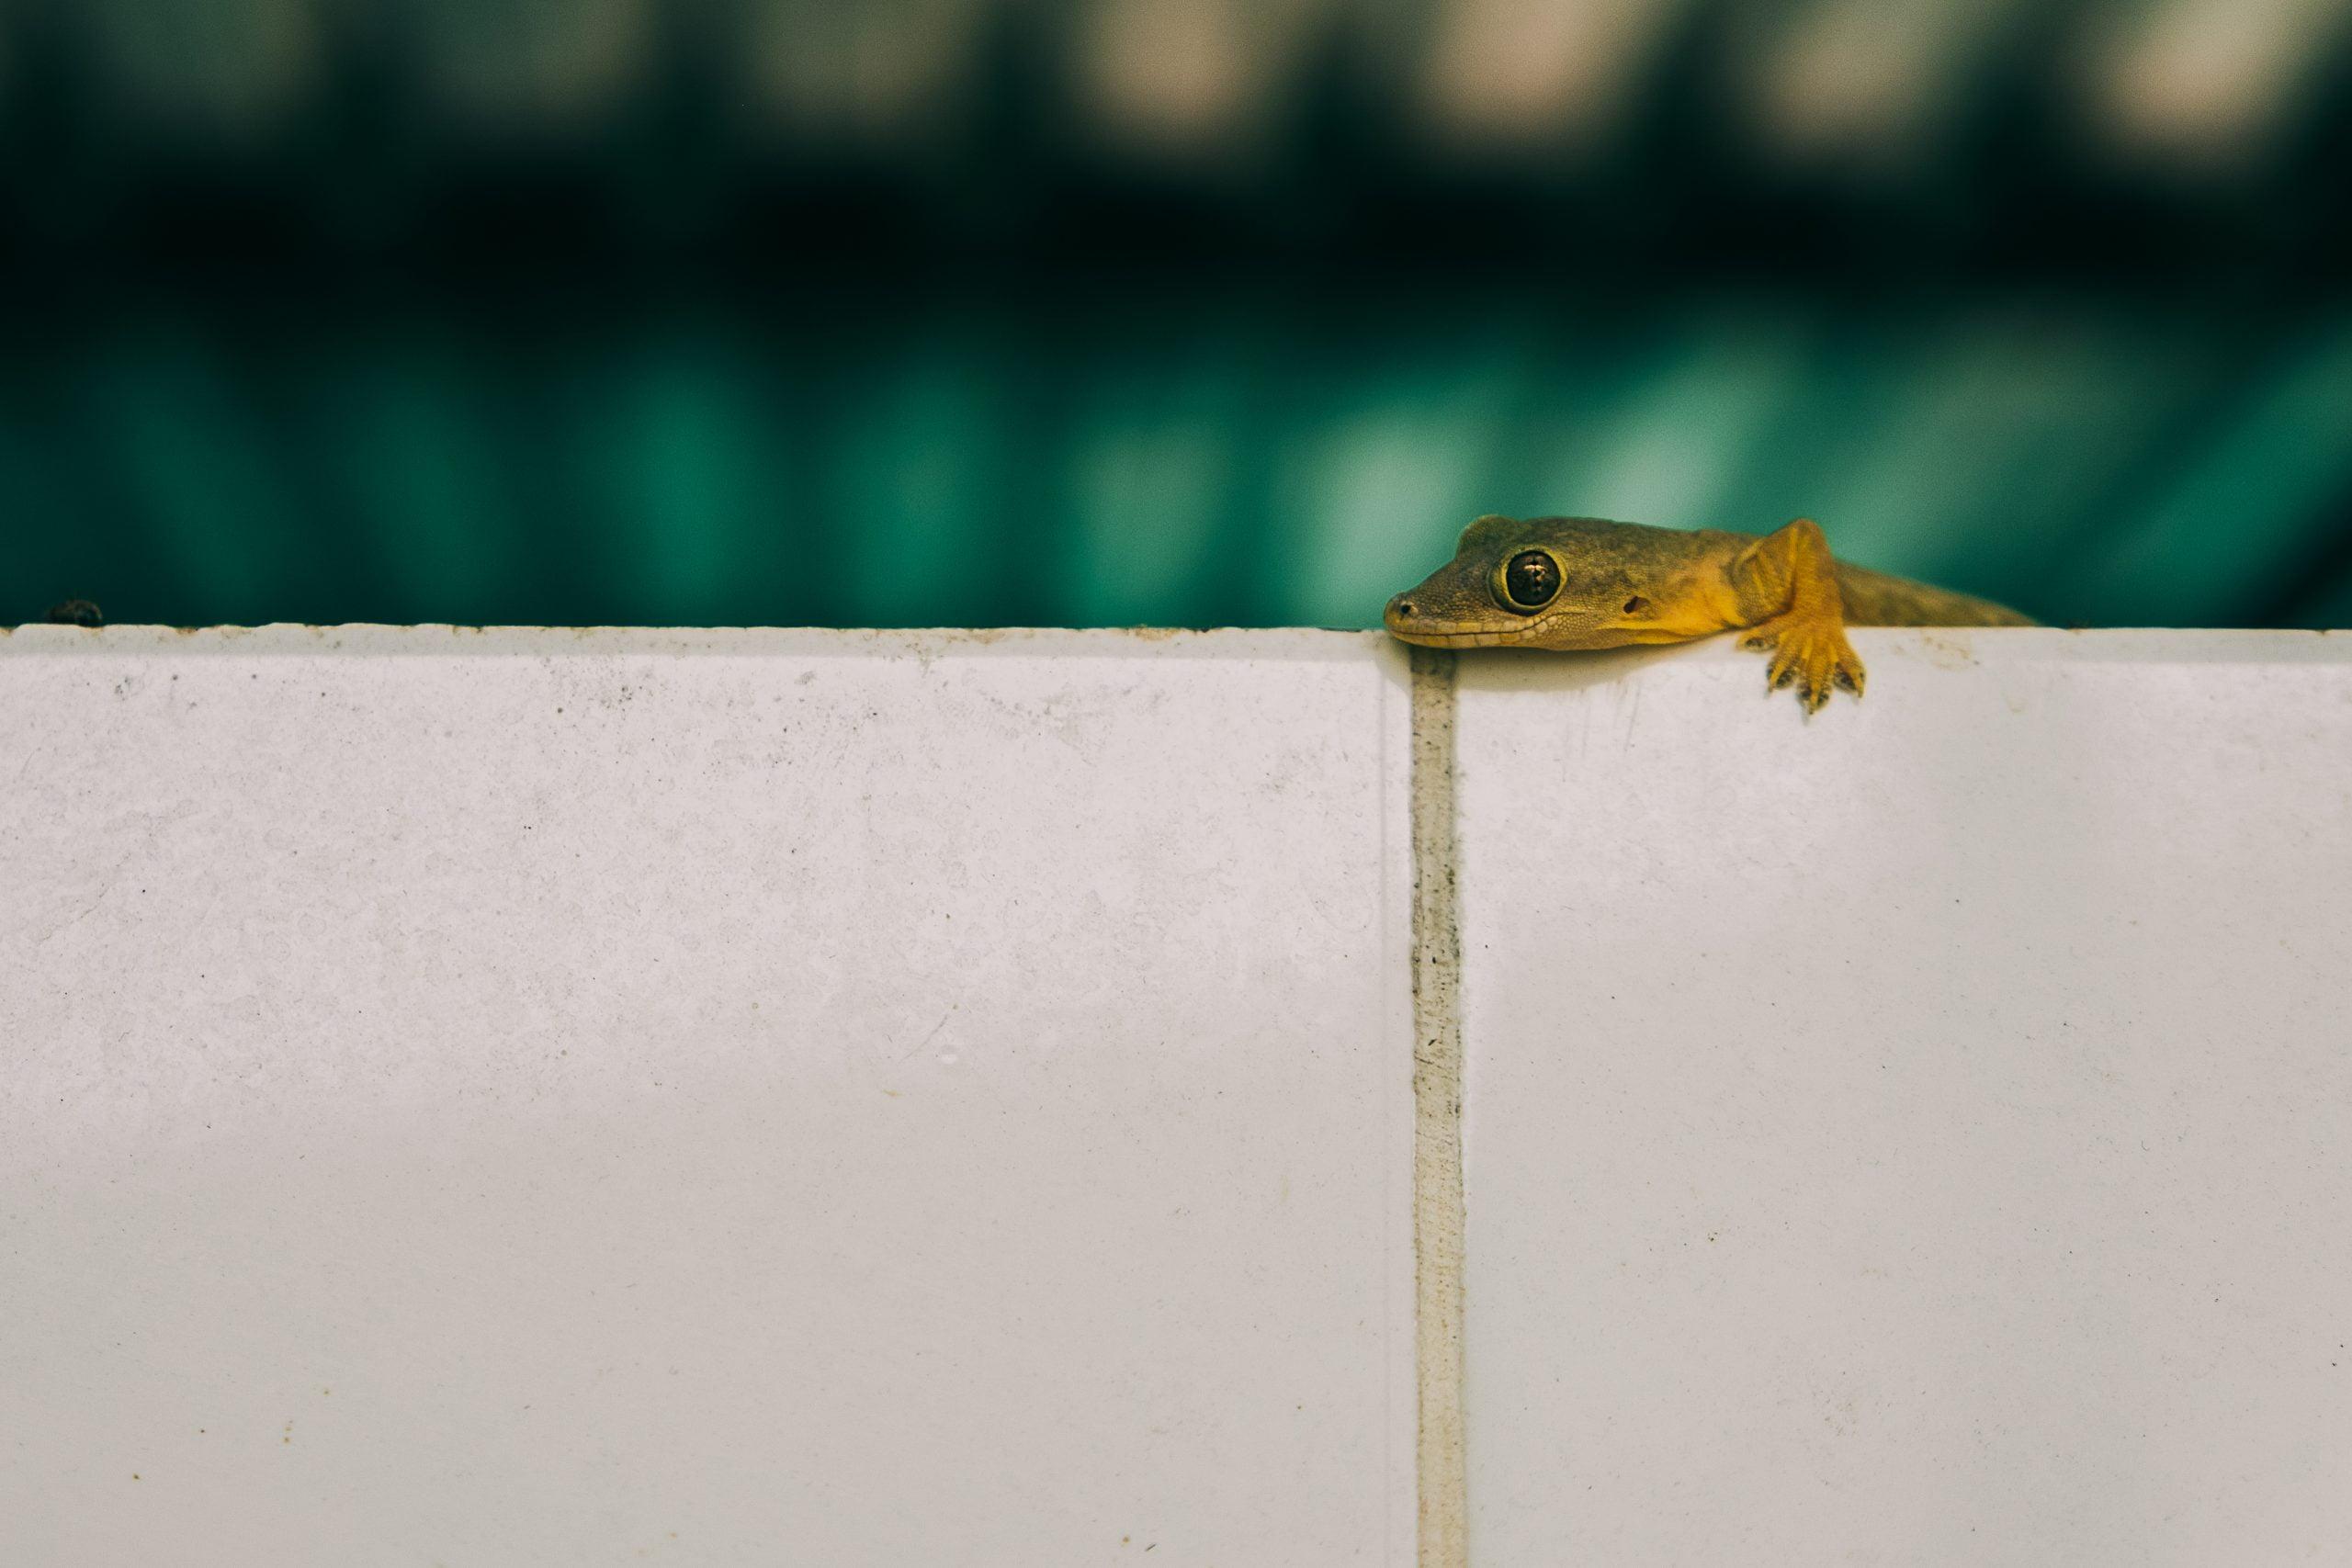 Close up to a house gecko lizard on wall